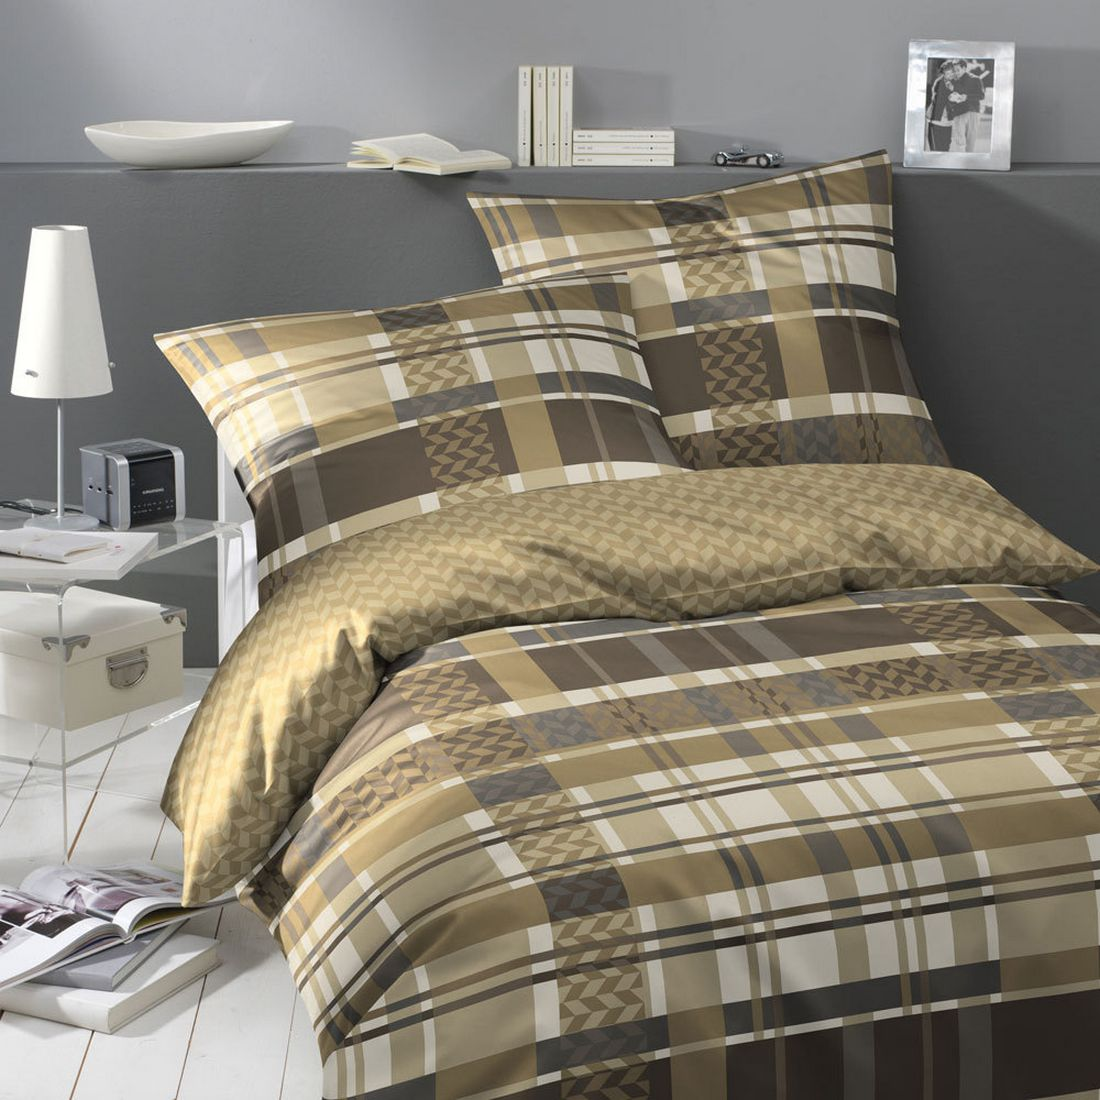 bettw sche santani goldbraun baumwolle mehrfarbig 155x220 cm 80x80 cm yes for bed. Black Bedroom Furniture Sets. Home Design Ideas